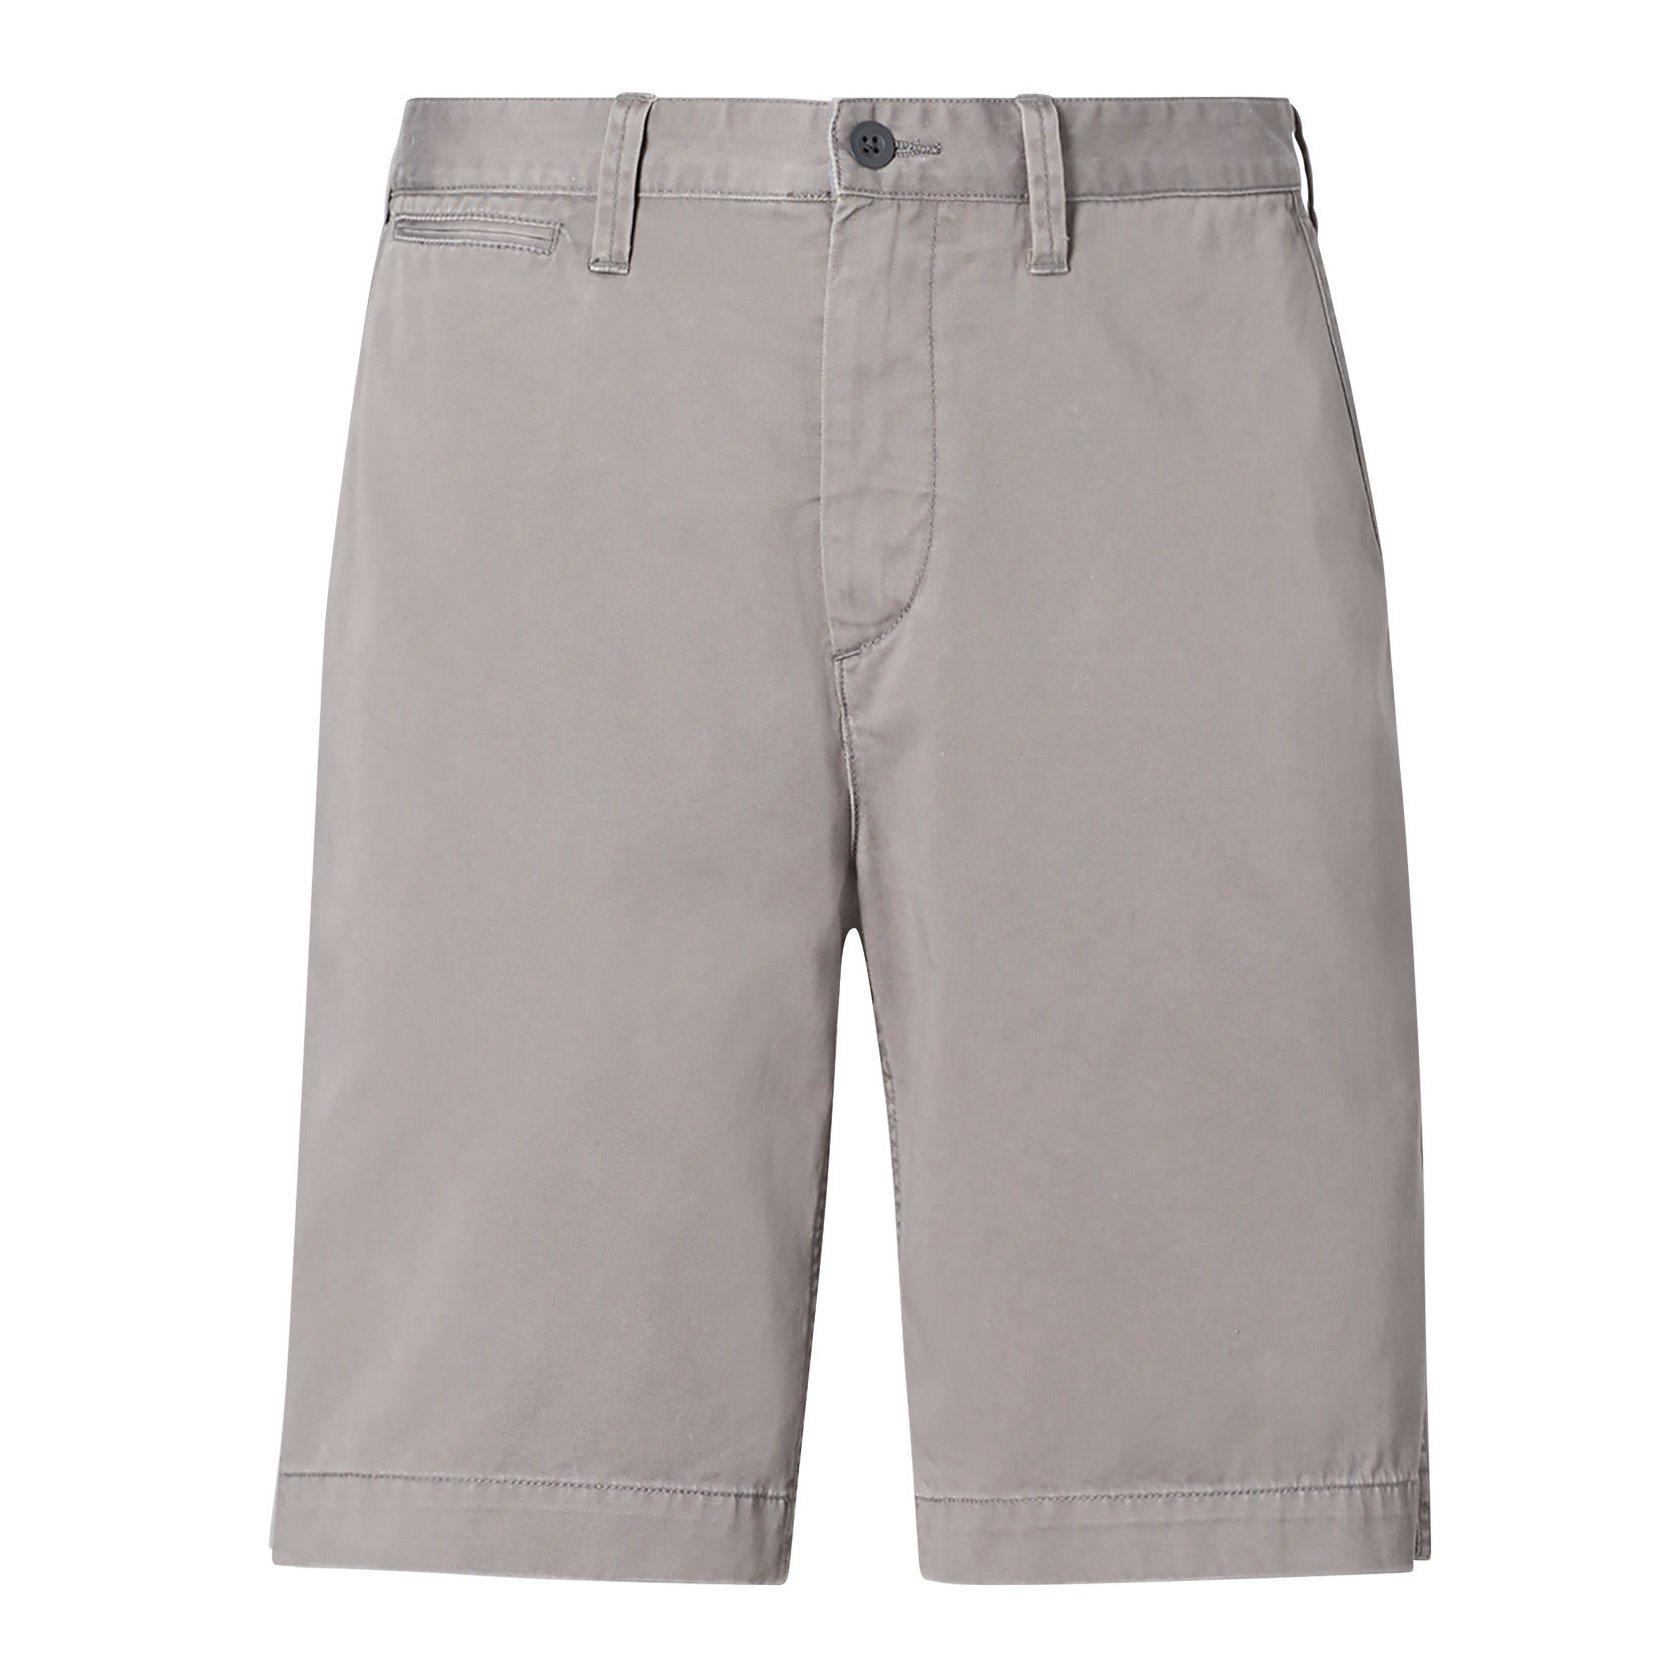 Ralph Lauren Polo Men's Cotton Chino Shorts, Grey (31W)